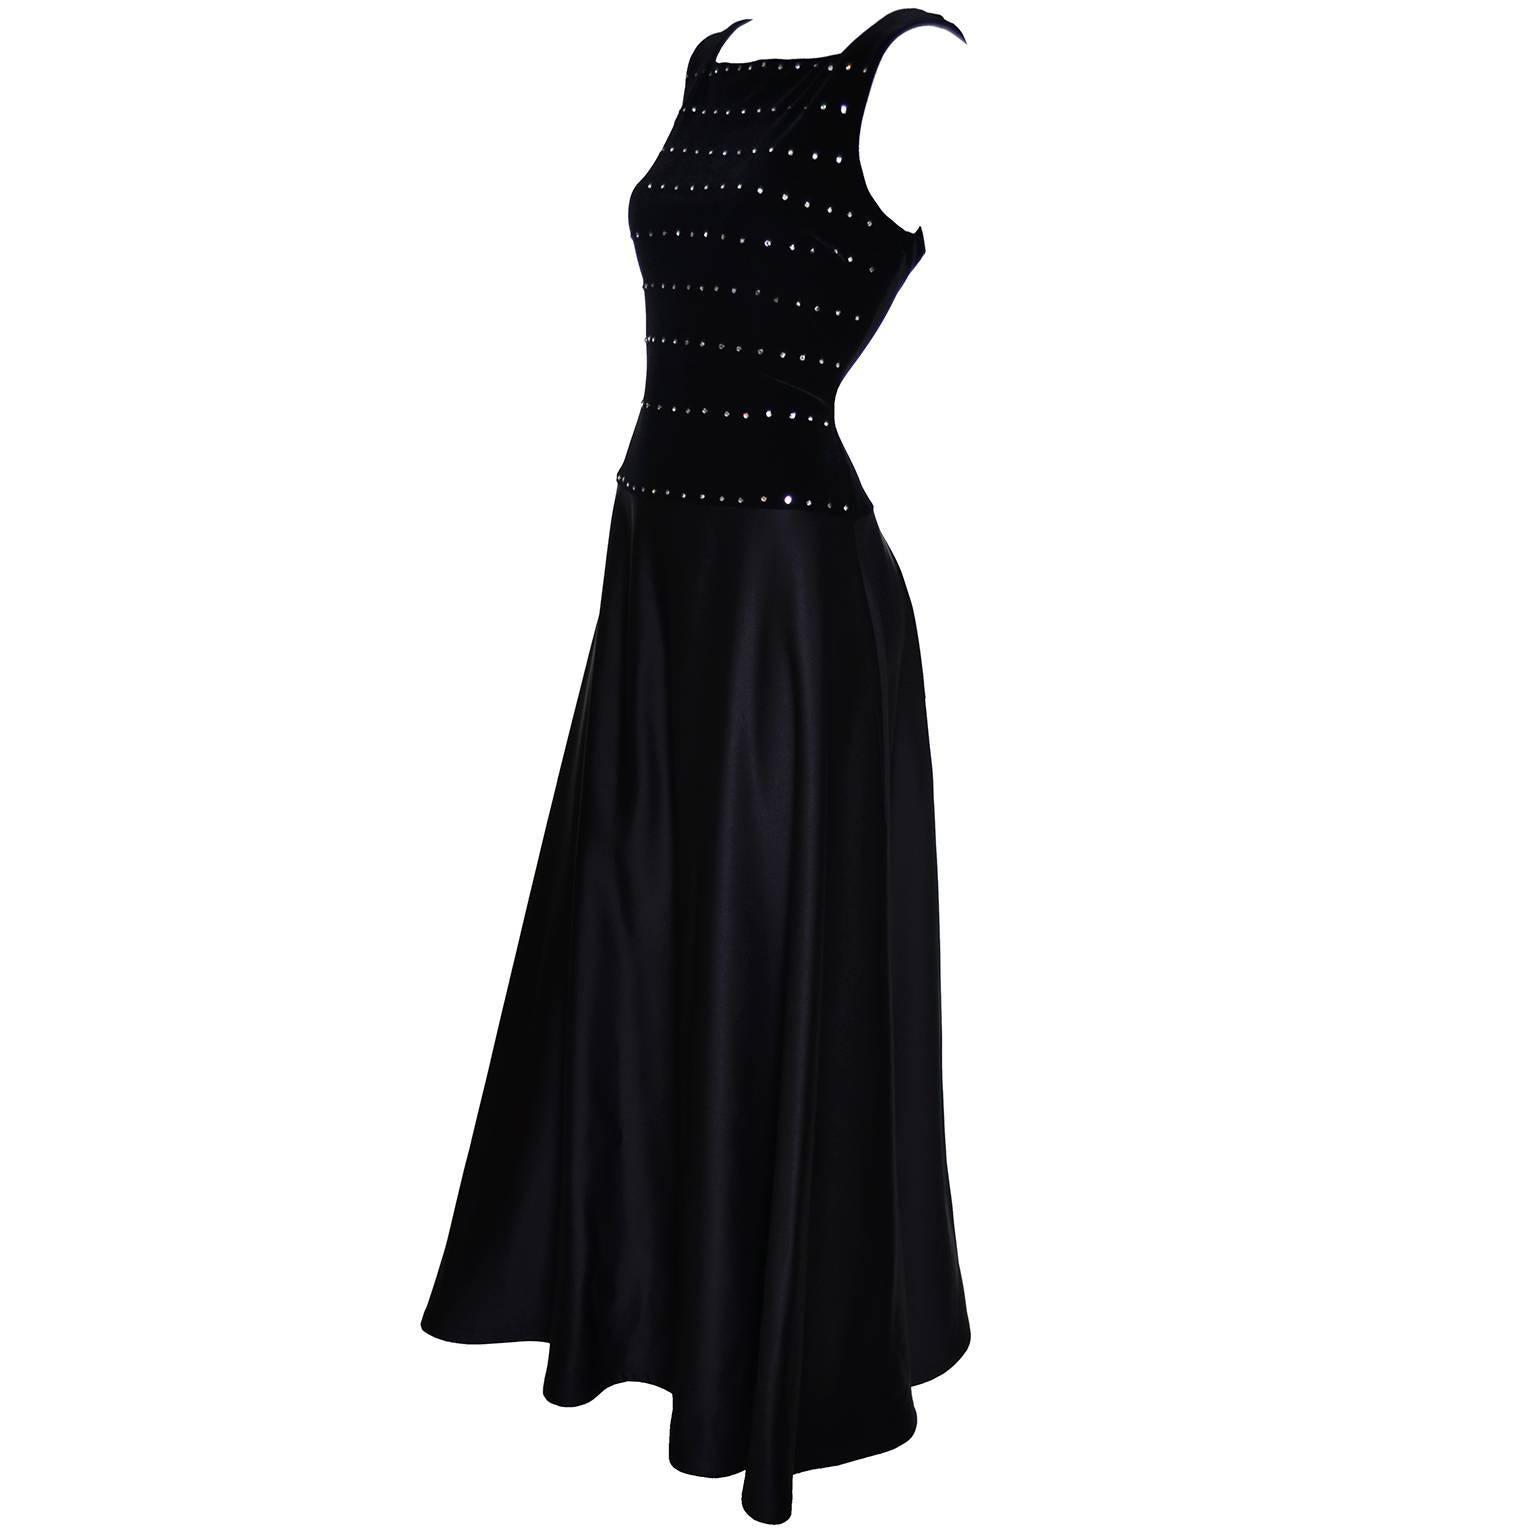 Tadashi Shoji Vintage Dress Black Satin Velvet Evening Gown Rhinestones 6